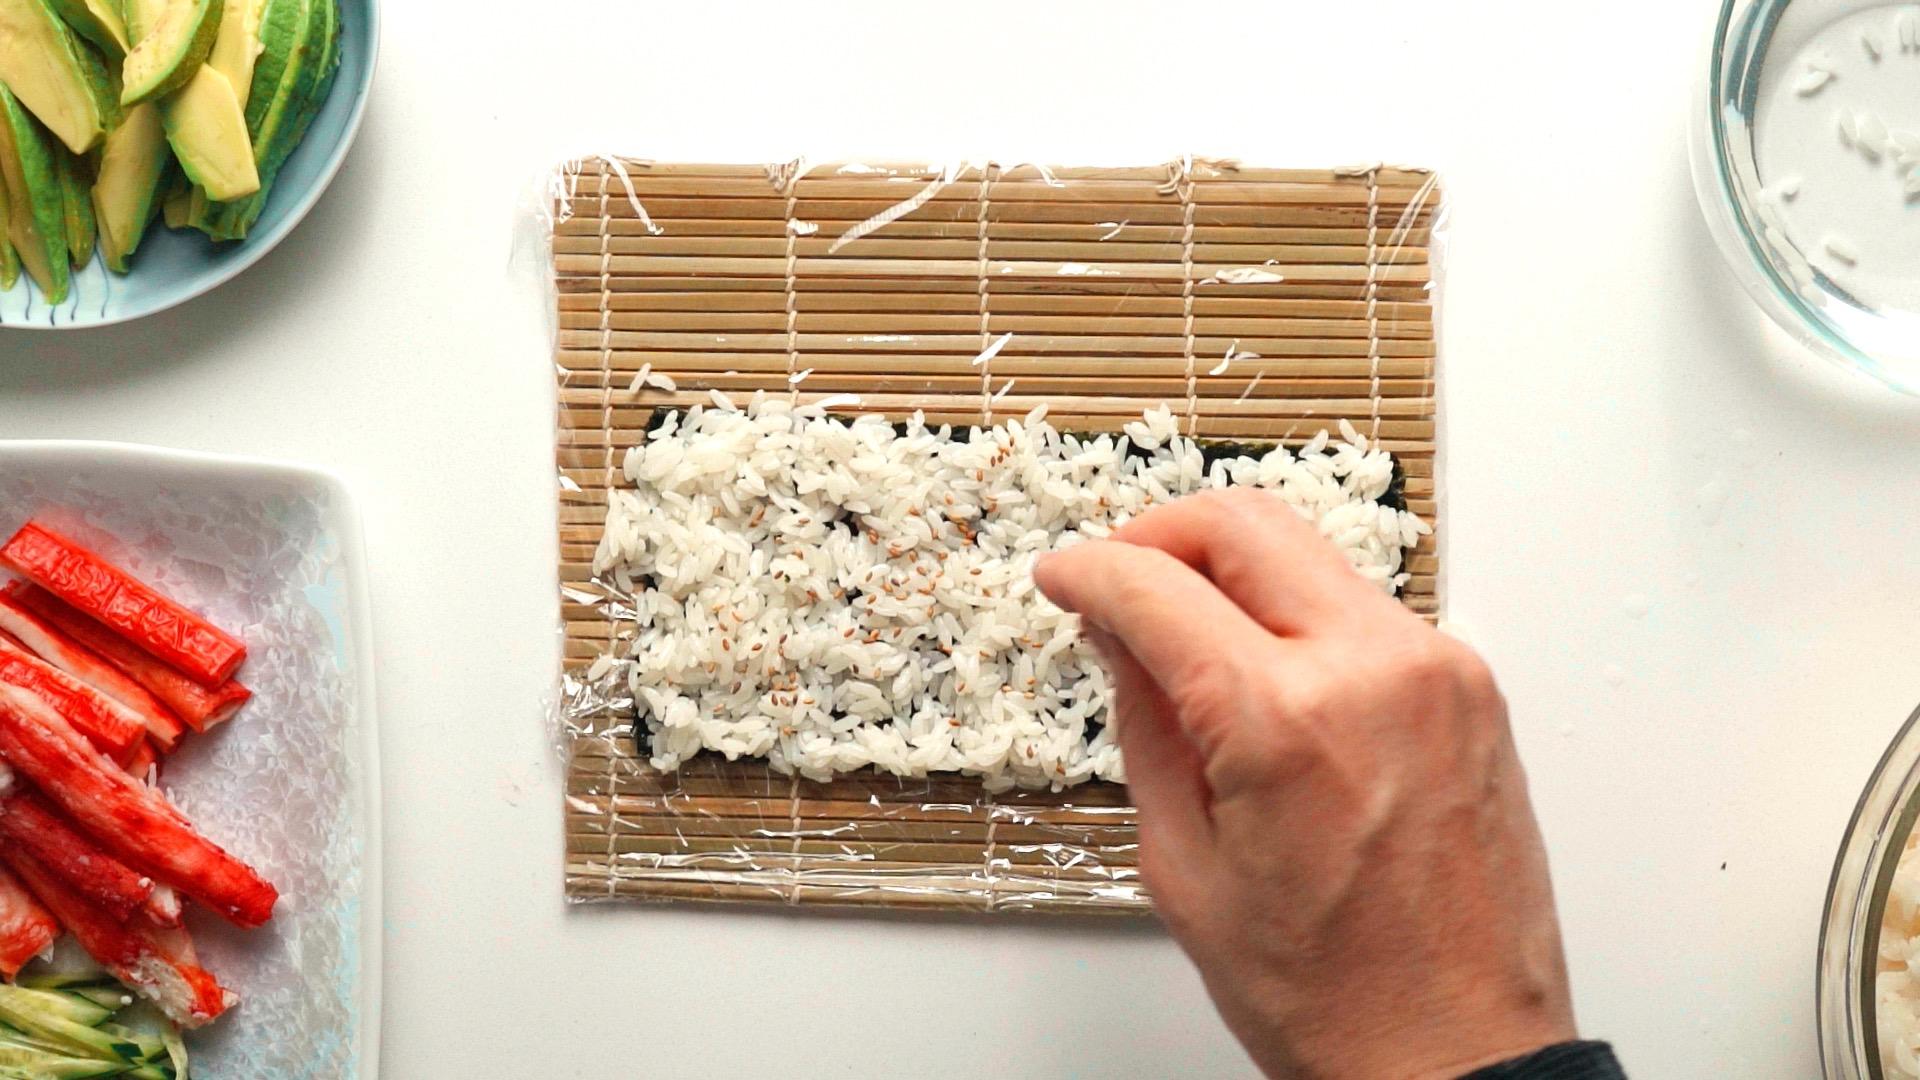 Sprinkle sesame seeds onto the rice.